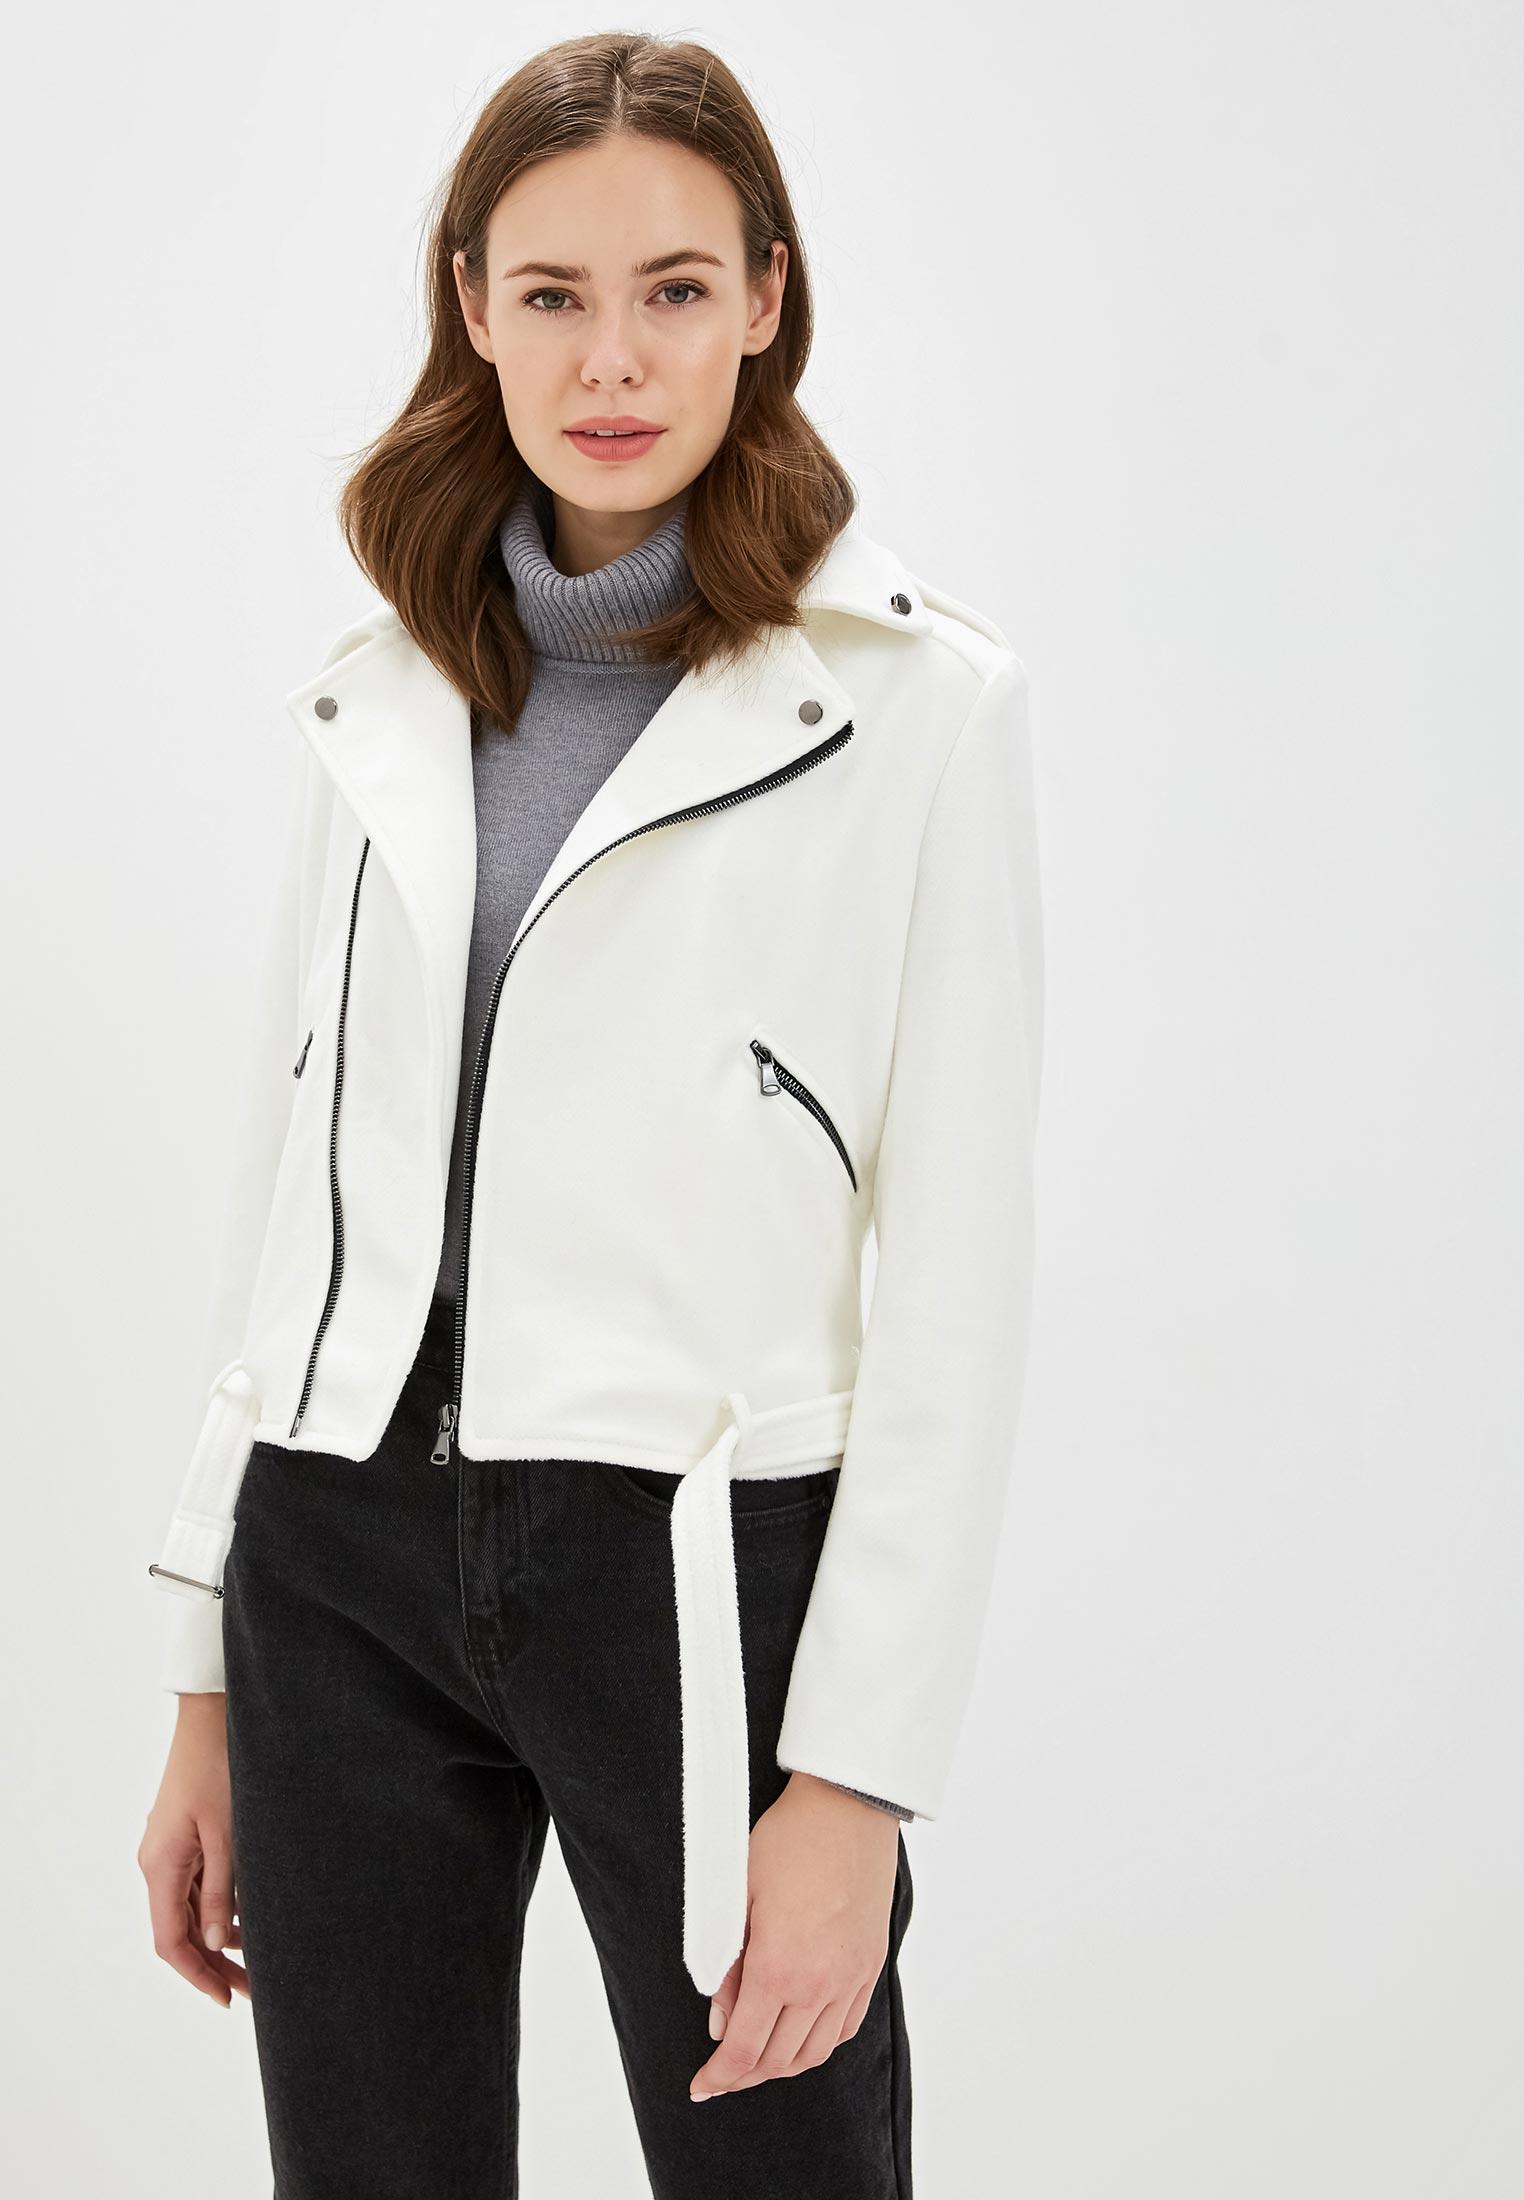 Куртка, Gold Chic Chili, цвет: белый. Артикул: MP002XW0IB4O. Одежда / Верхняя одежда / Косухи